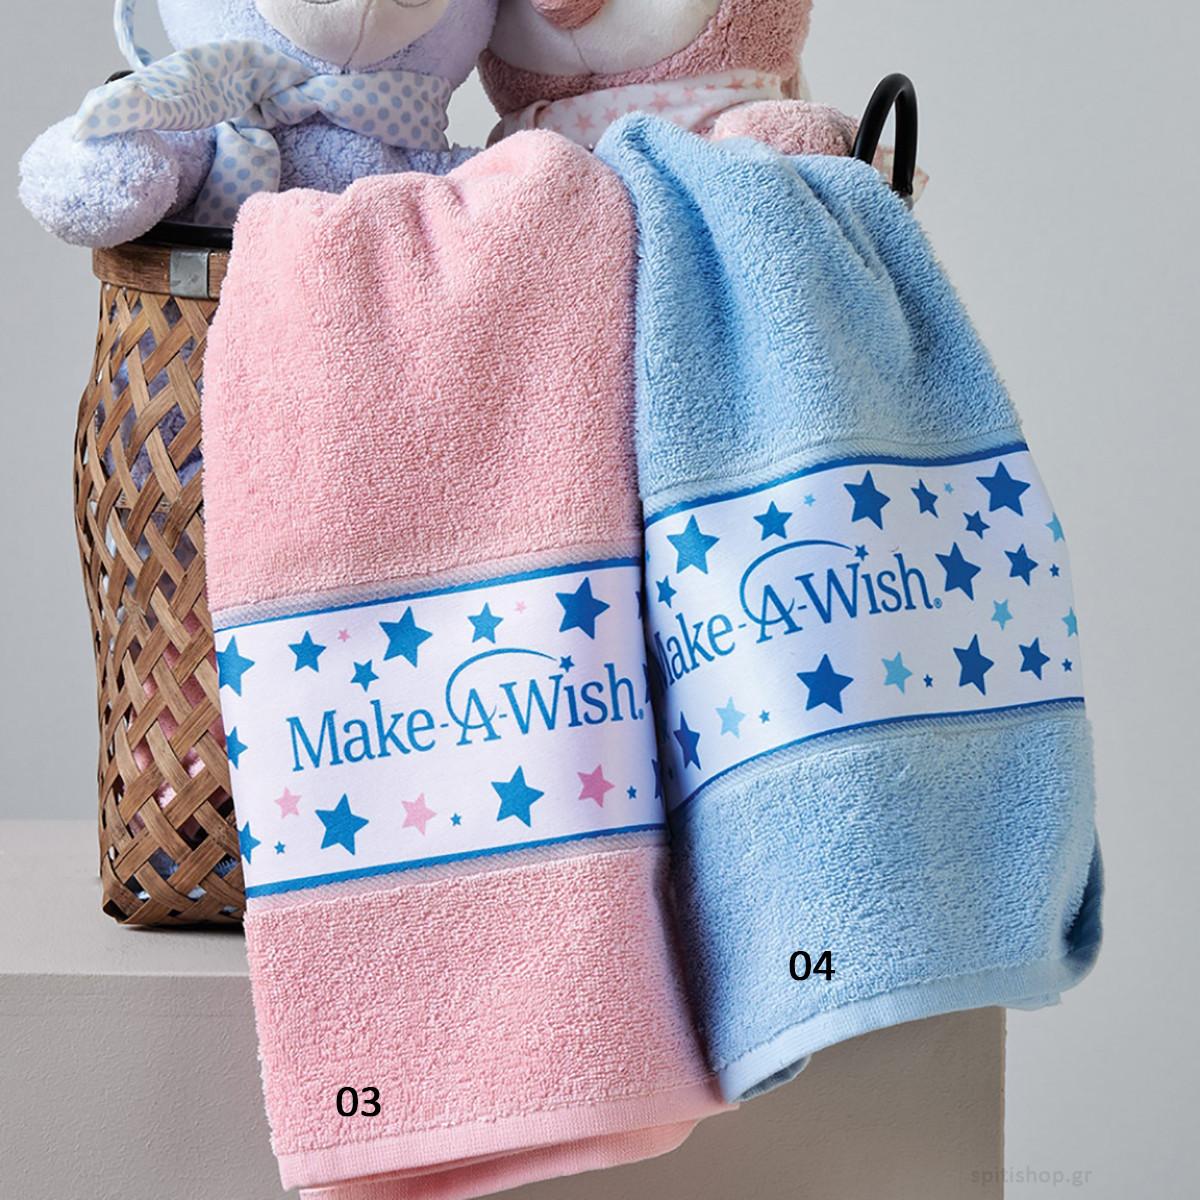 aa25fa158b8 Spiti Shop Παιδικές Πετσέτες (Σετ 2τμχ) Kentia Make A Wish